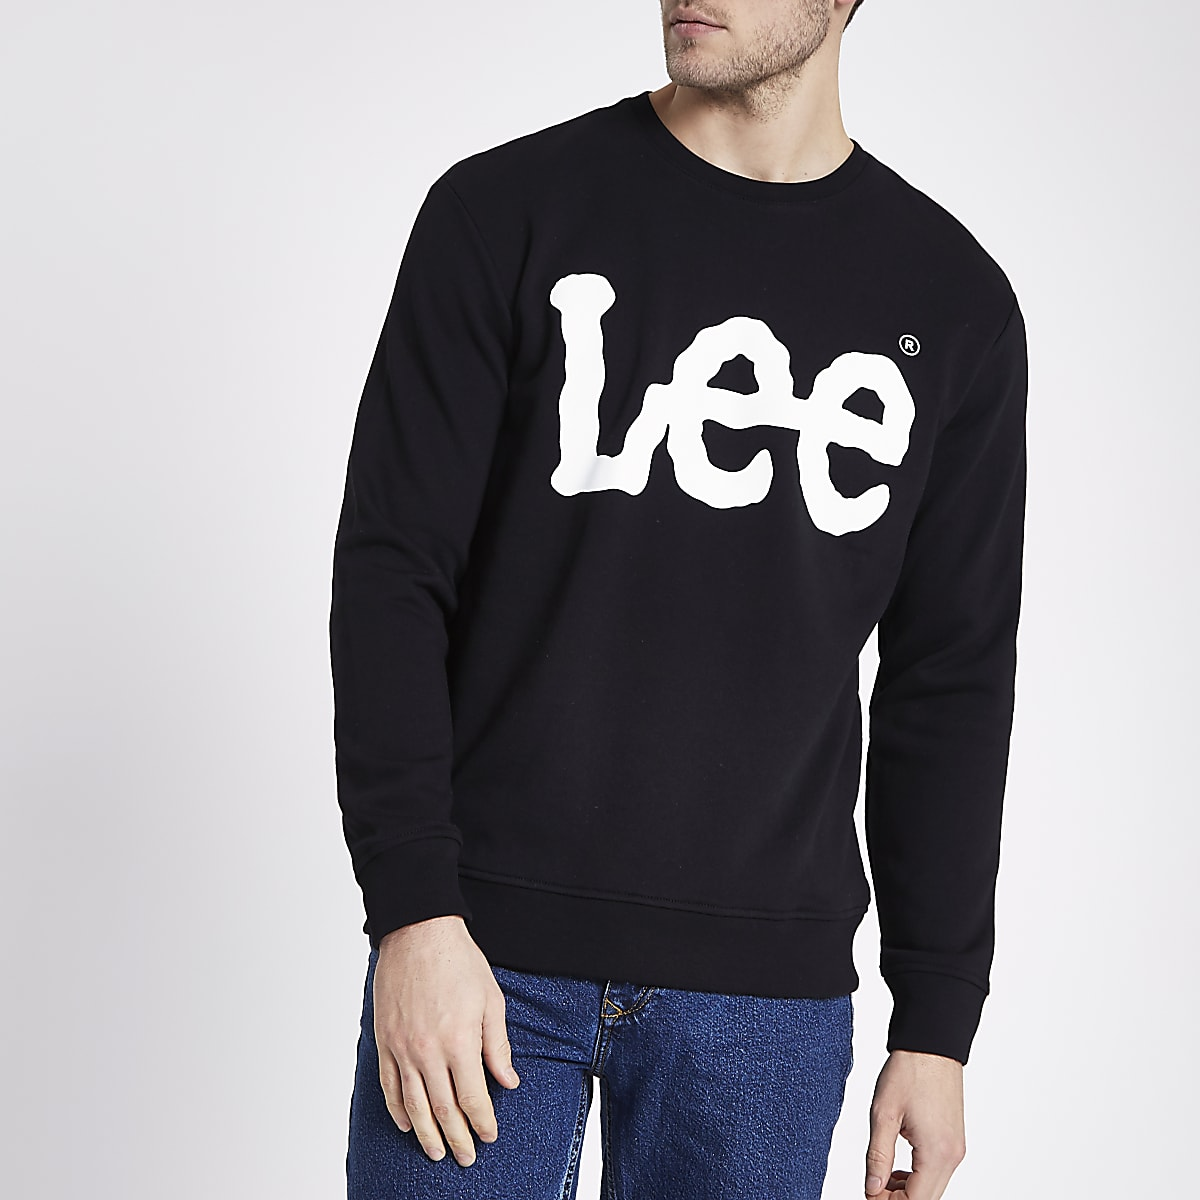 Lee black logo print sweatshirt